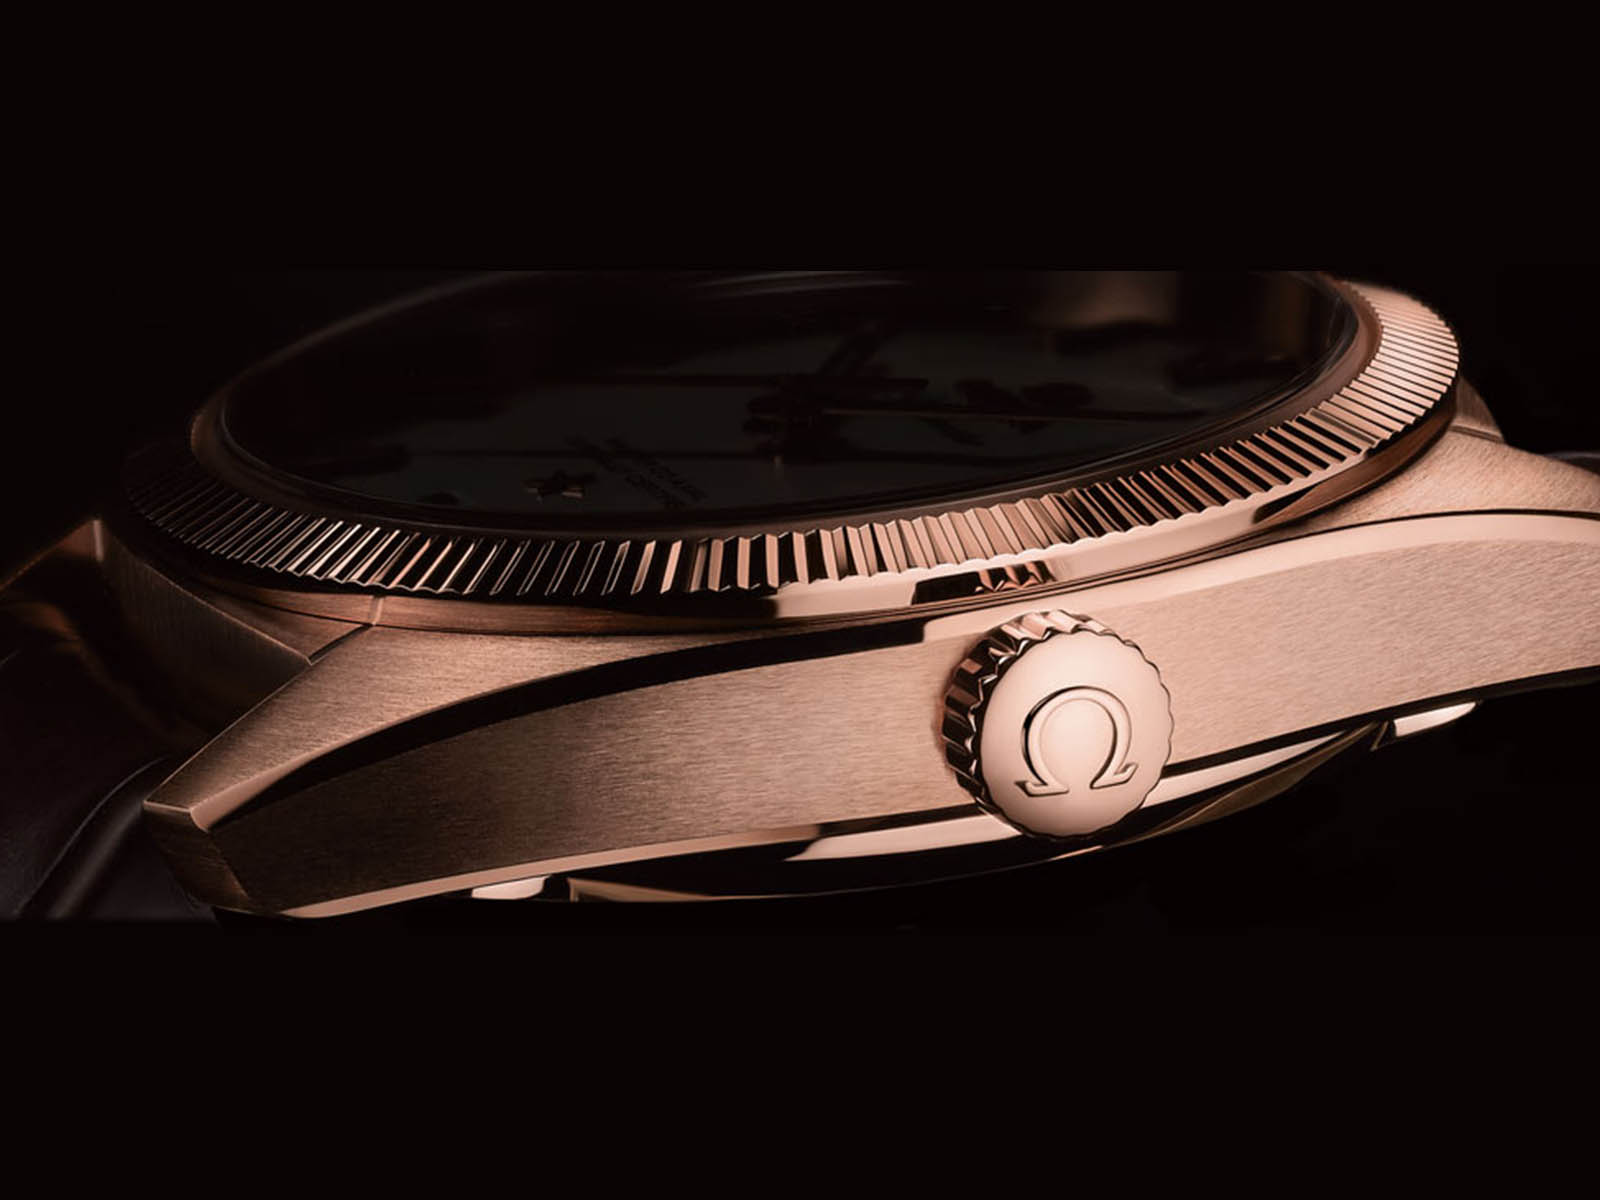 omega-seamaster-diver-300m-chronograph-gold-titanium-tantalum-11.jpg